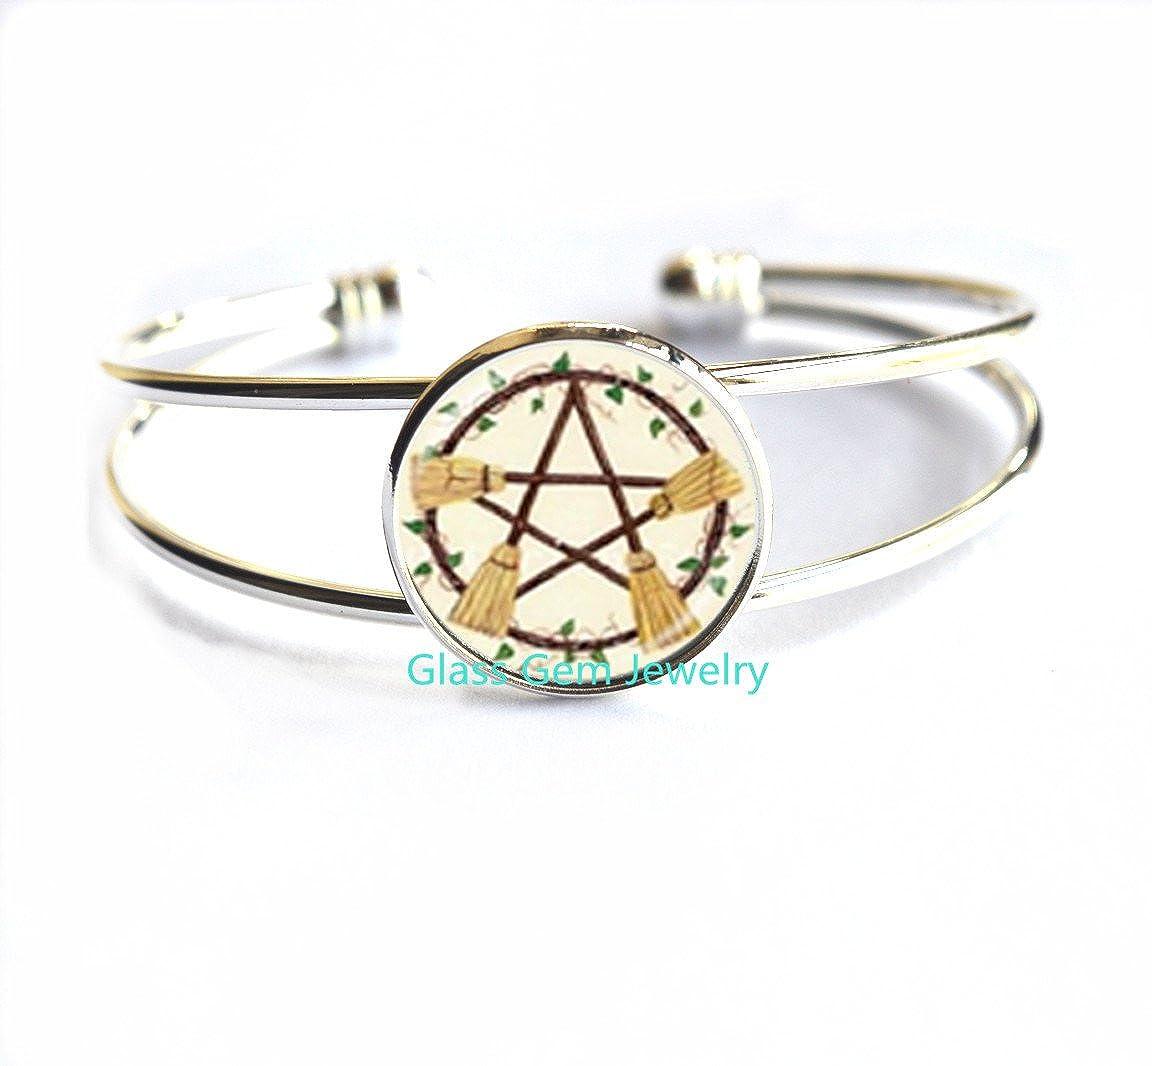 Wicca Broom Pentagram Bracelet Pentacle Bracelets Wiccan Witch Jewelry Glass Cabochon Silver Statement Long Chain Bracelet,Q0223